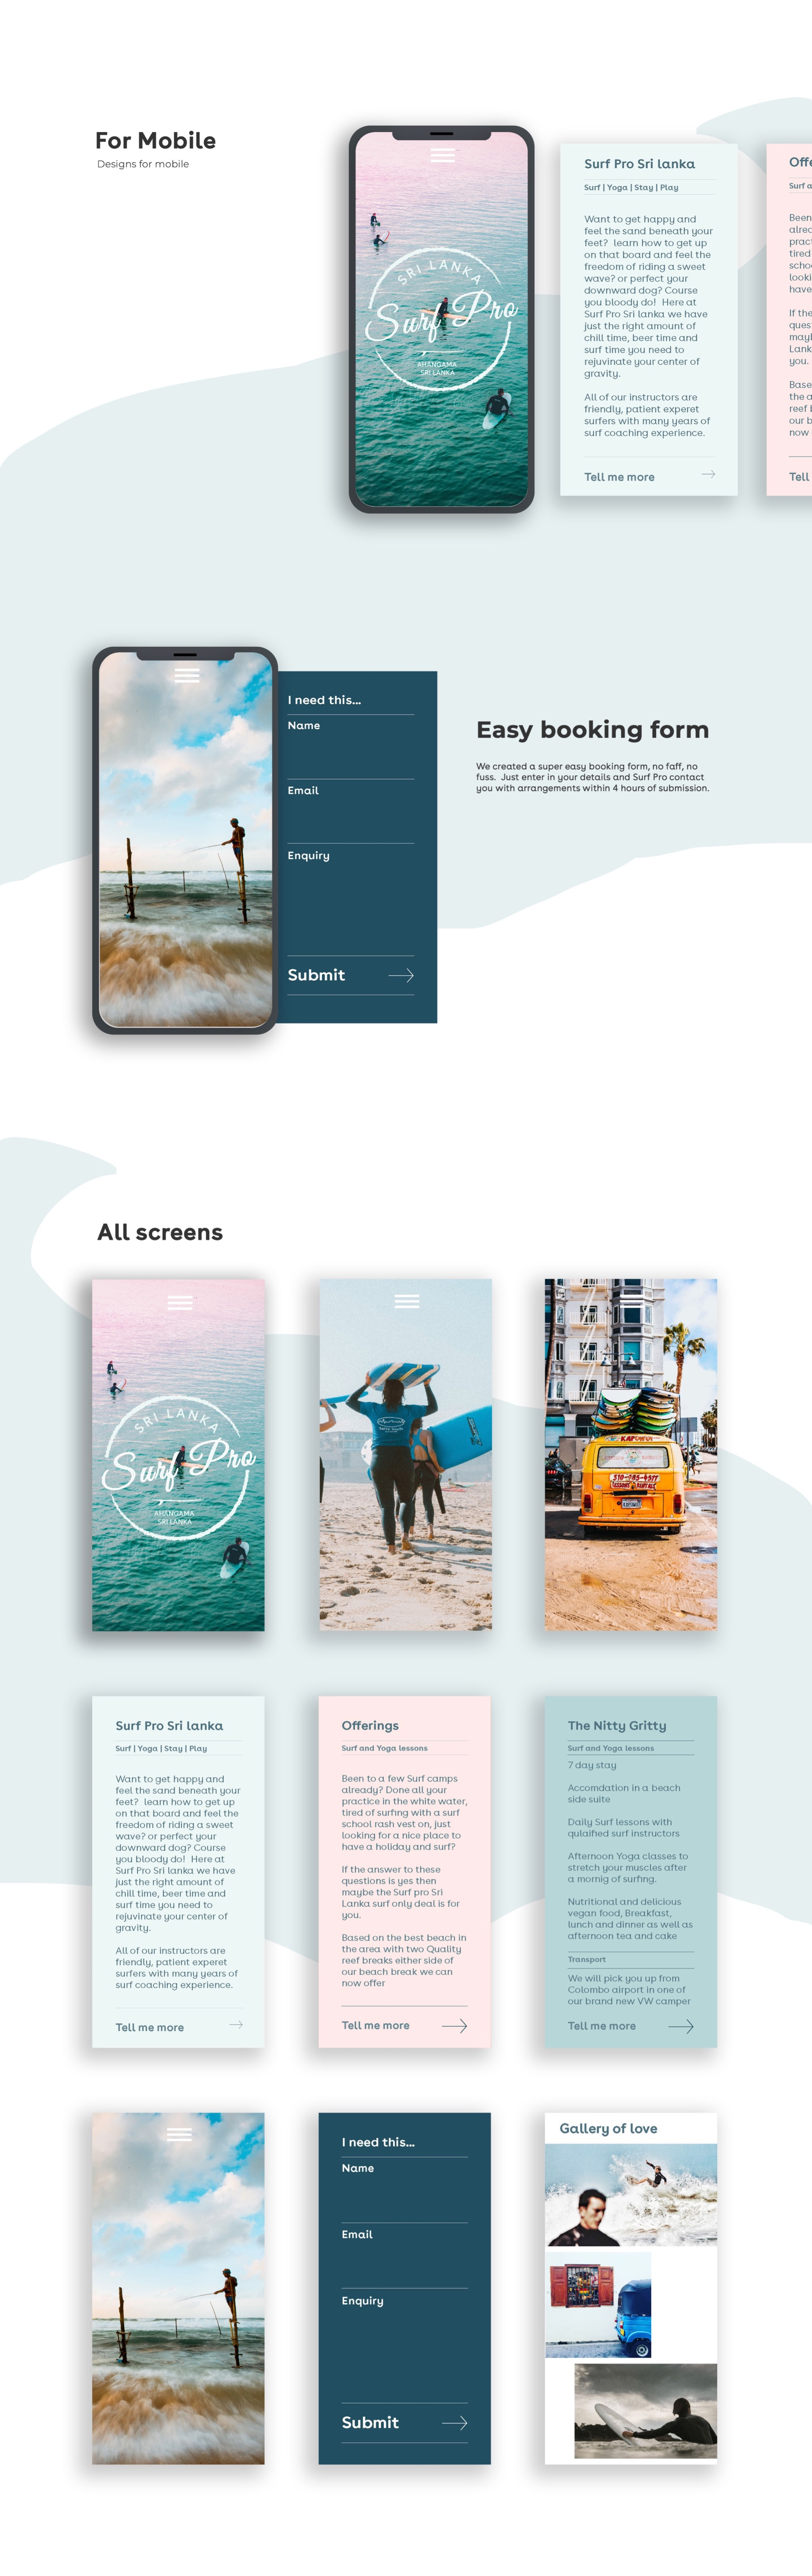 Mobile mockup (1).jpg